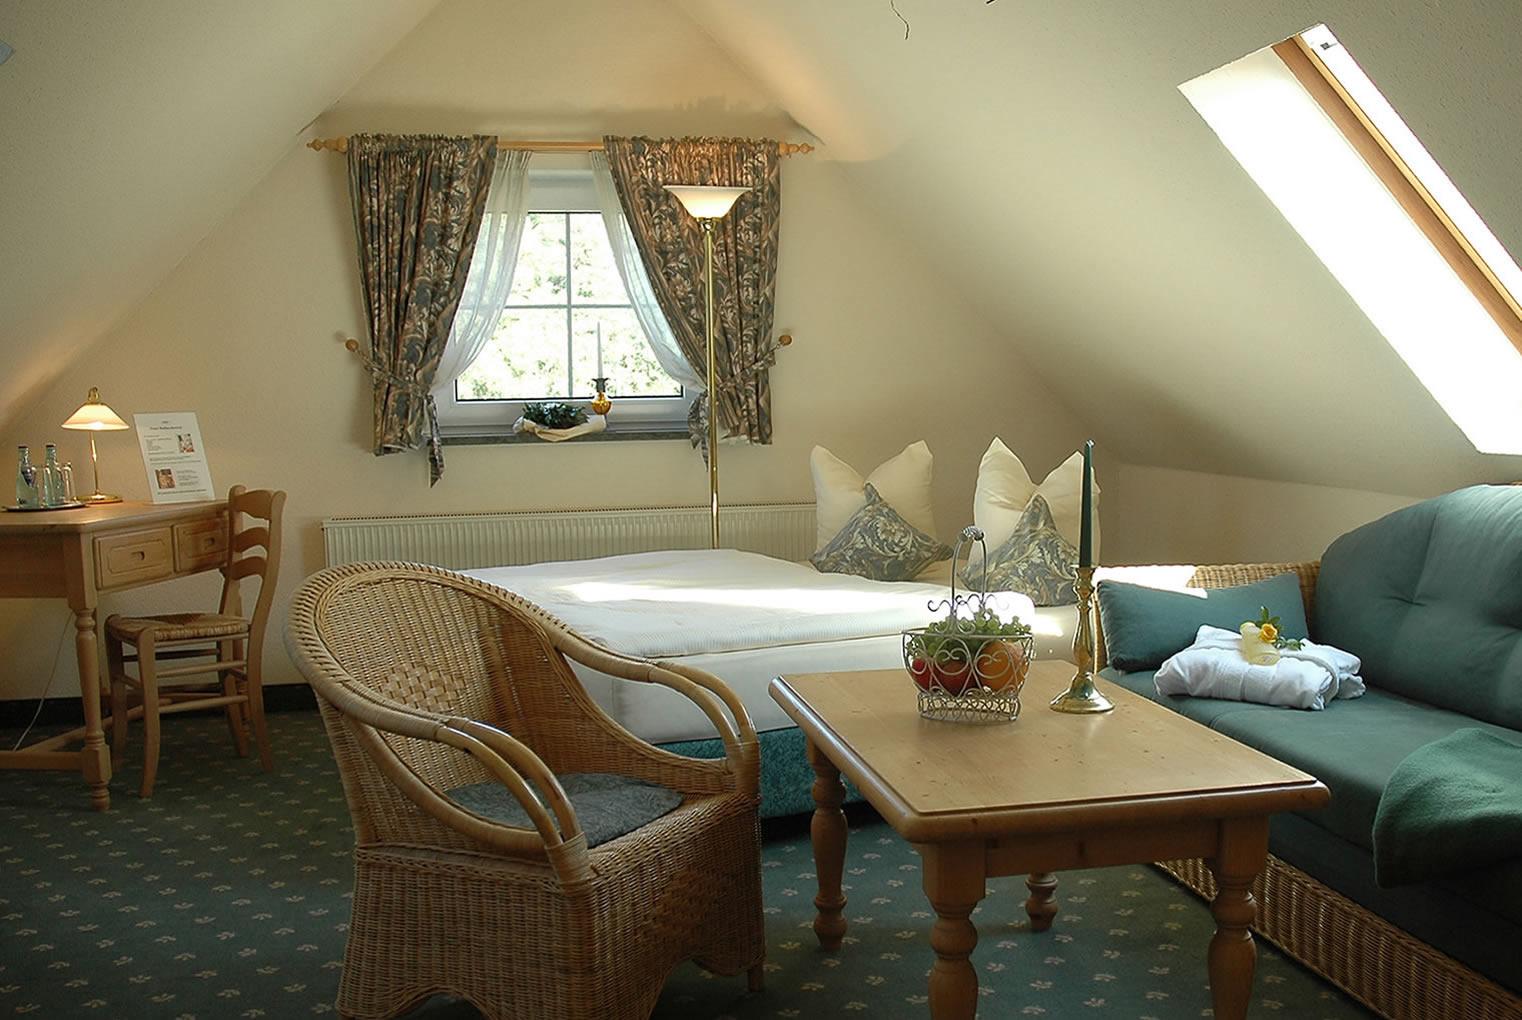 wellnesshotel appartementhotel mit fr hst ck in dresden nahe mei en radebeul. Black Bedroom Furniture Sets. Home Design Ideas